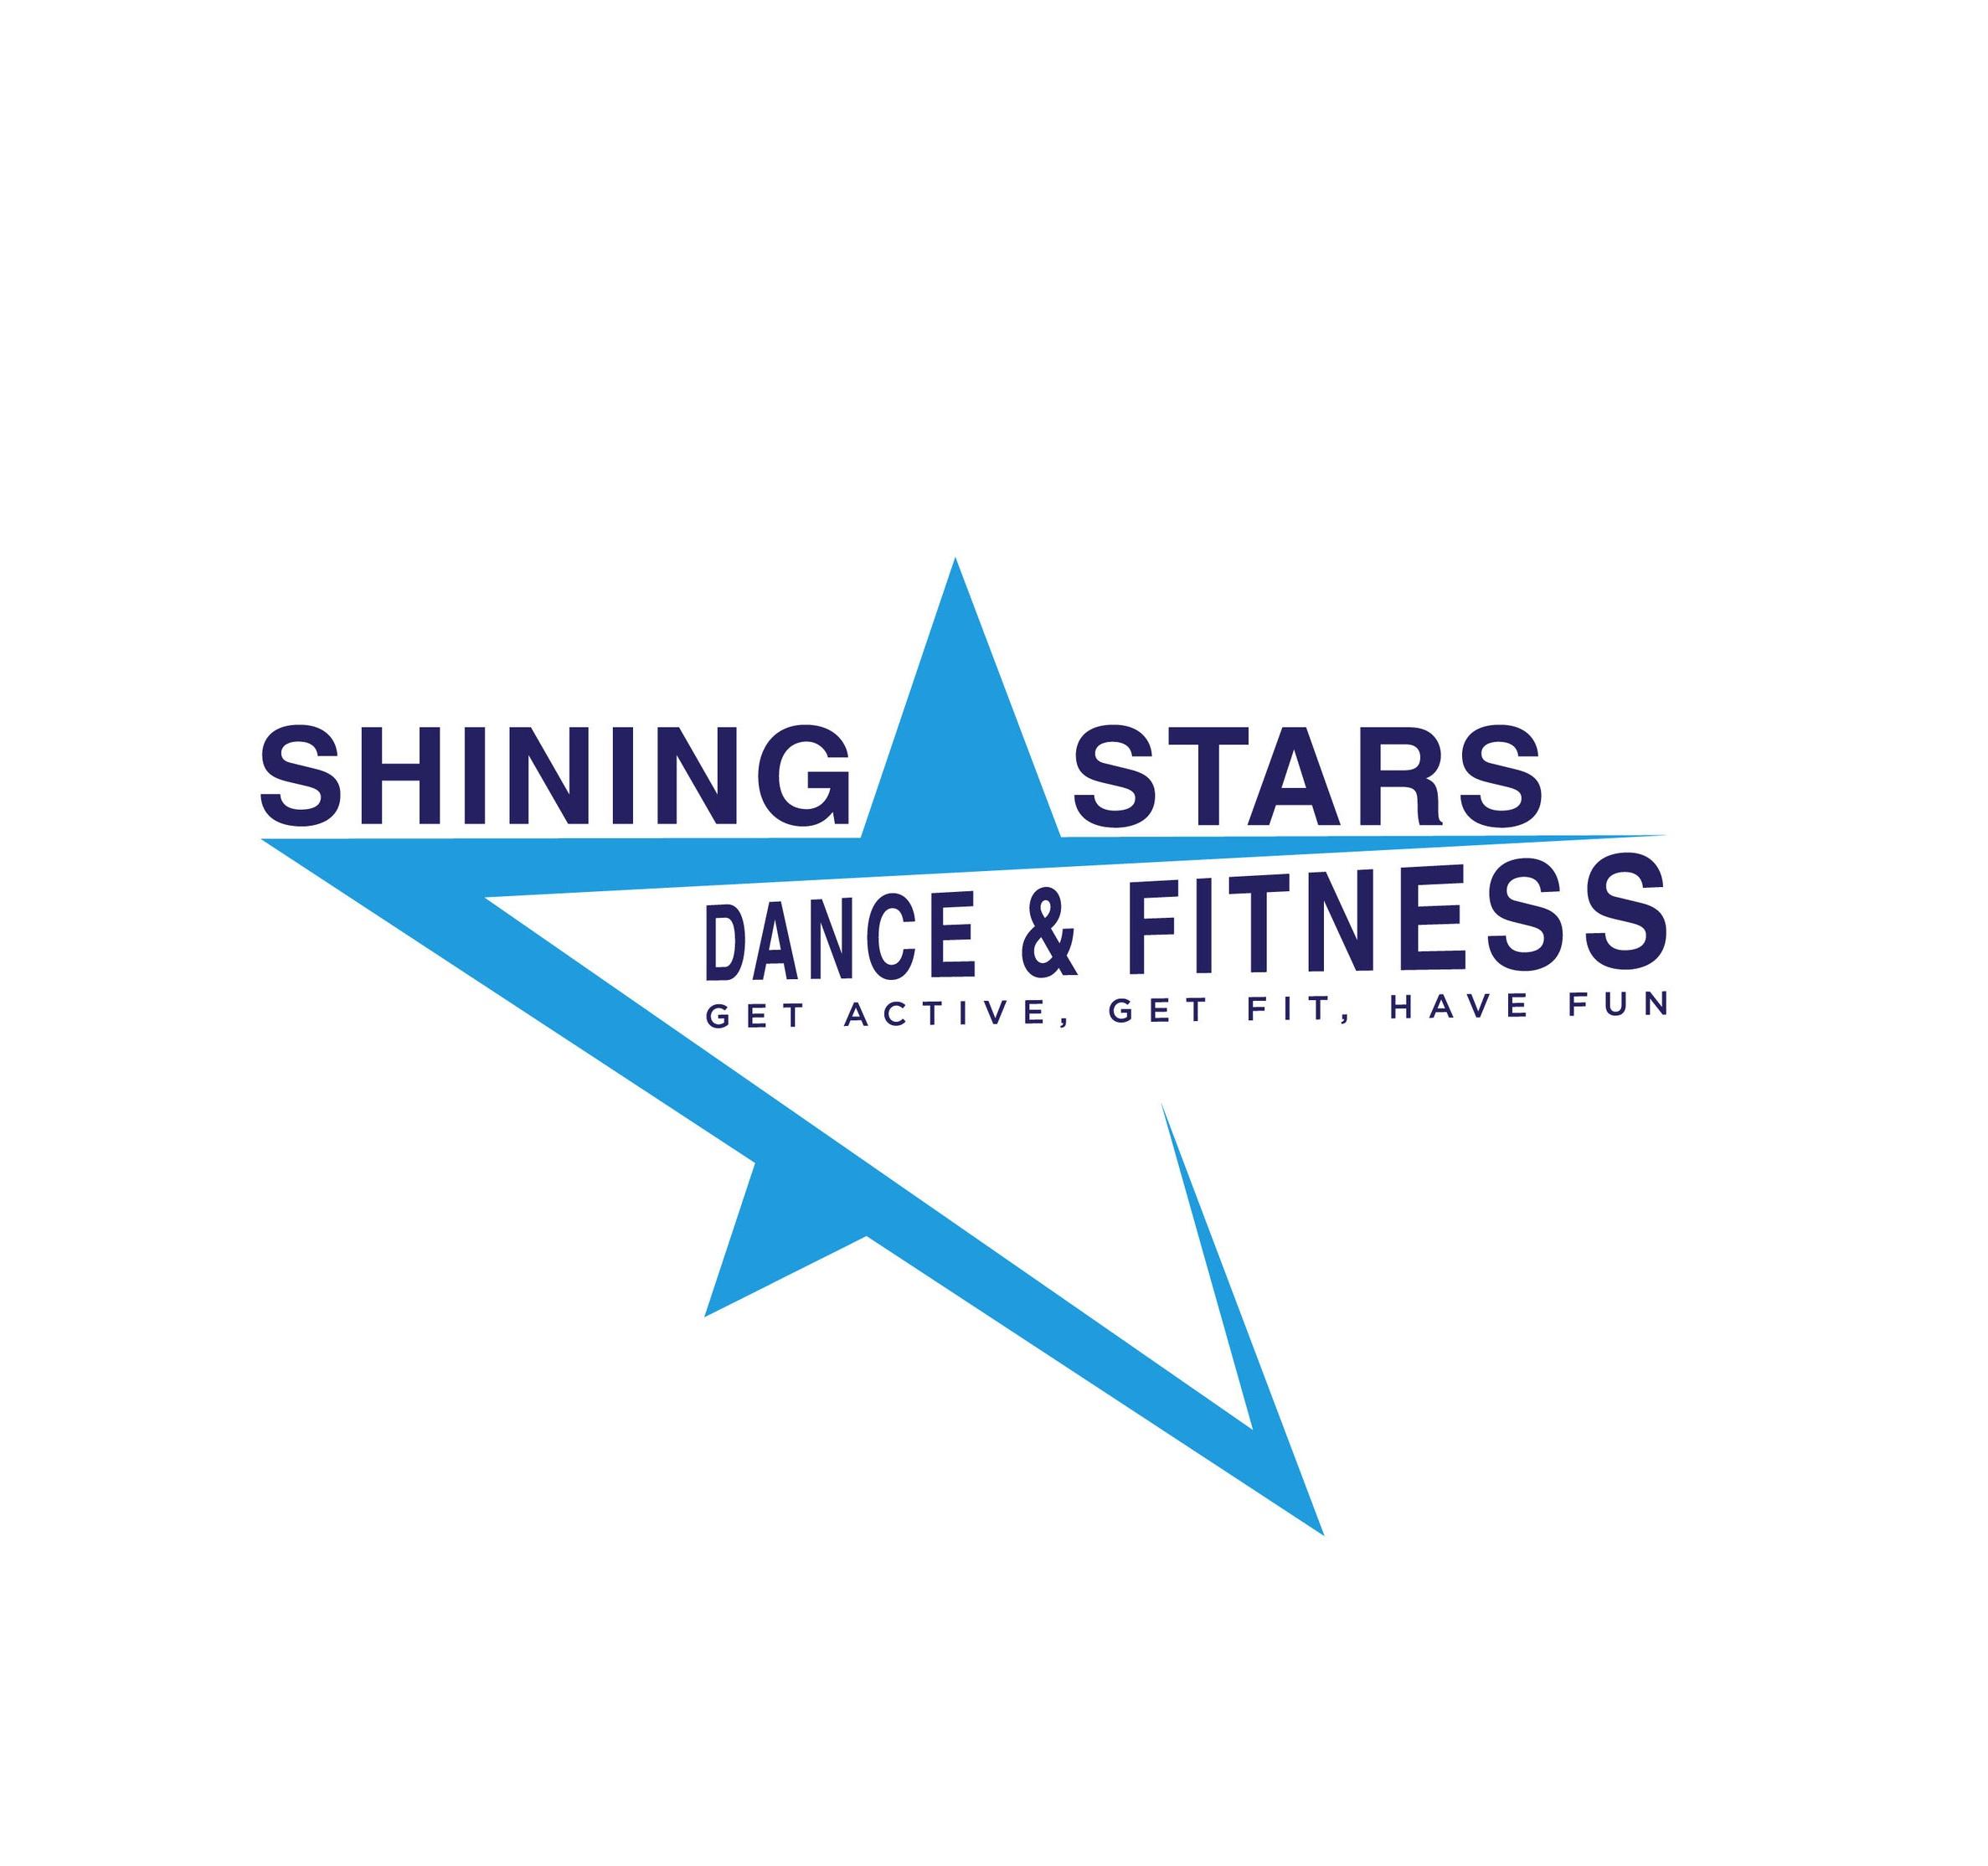 994_Shining+Stars+Dance+%26+Fitness_A_02.jpg